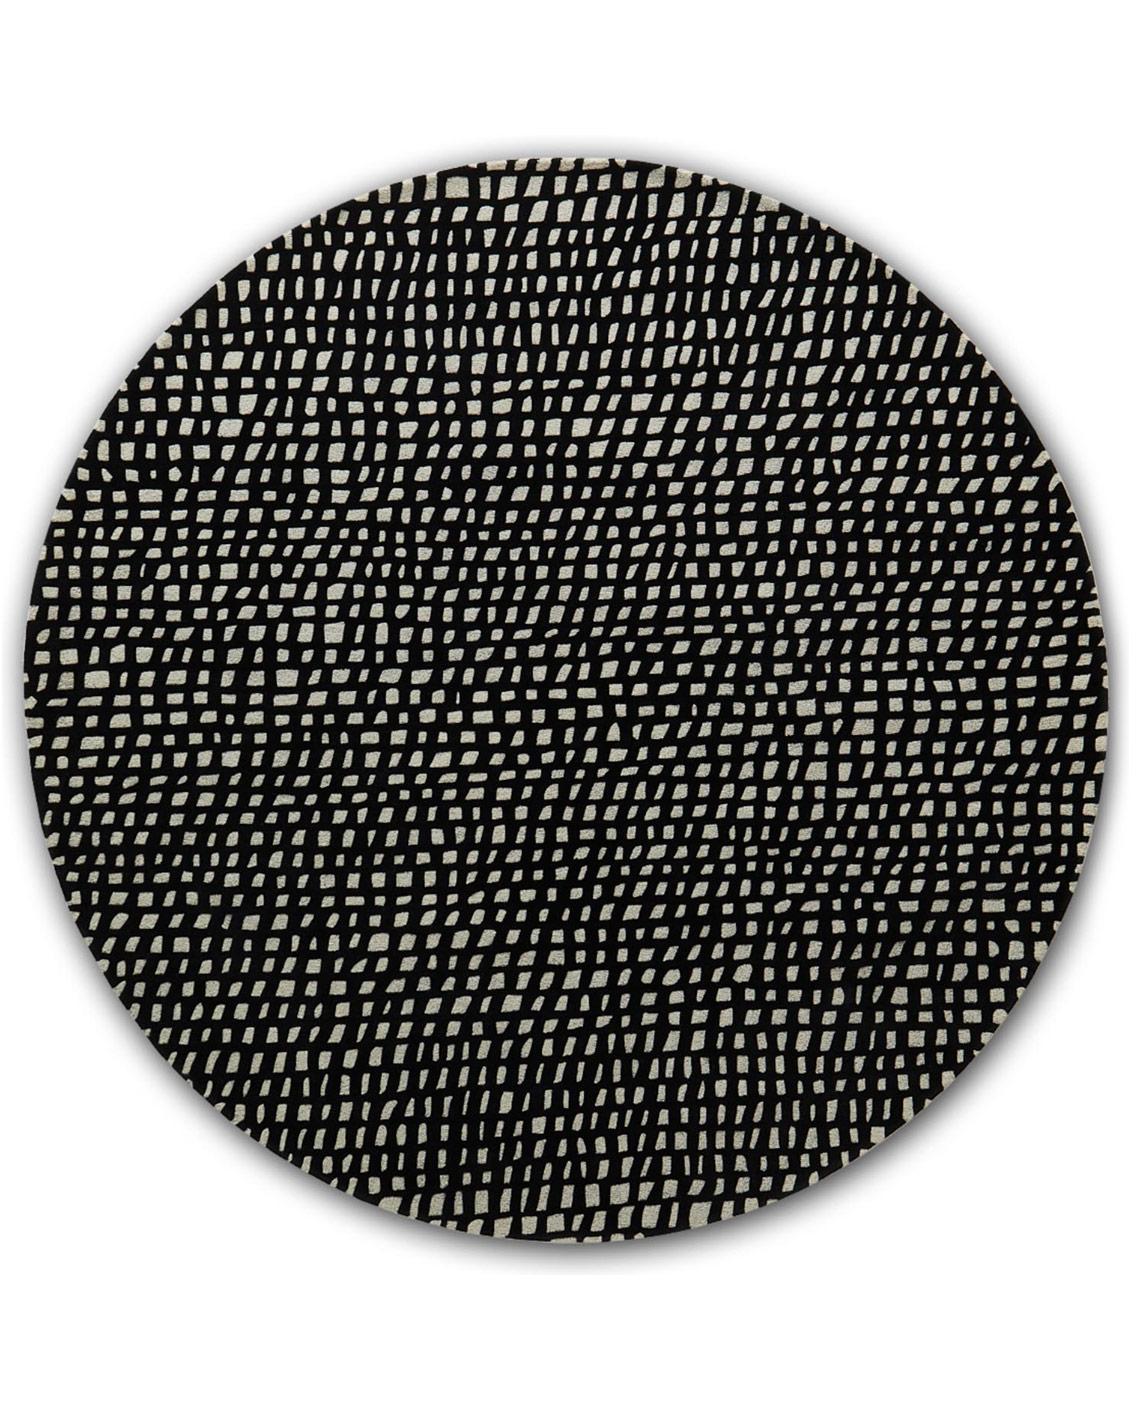 angela adams Fish Net Black Bass contemporary modern rug